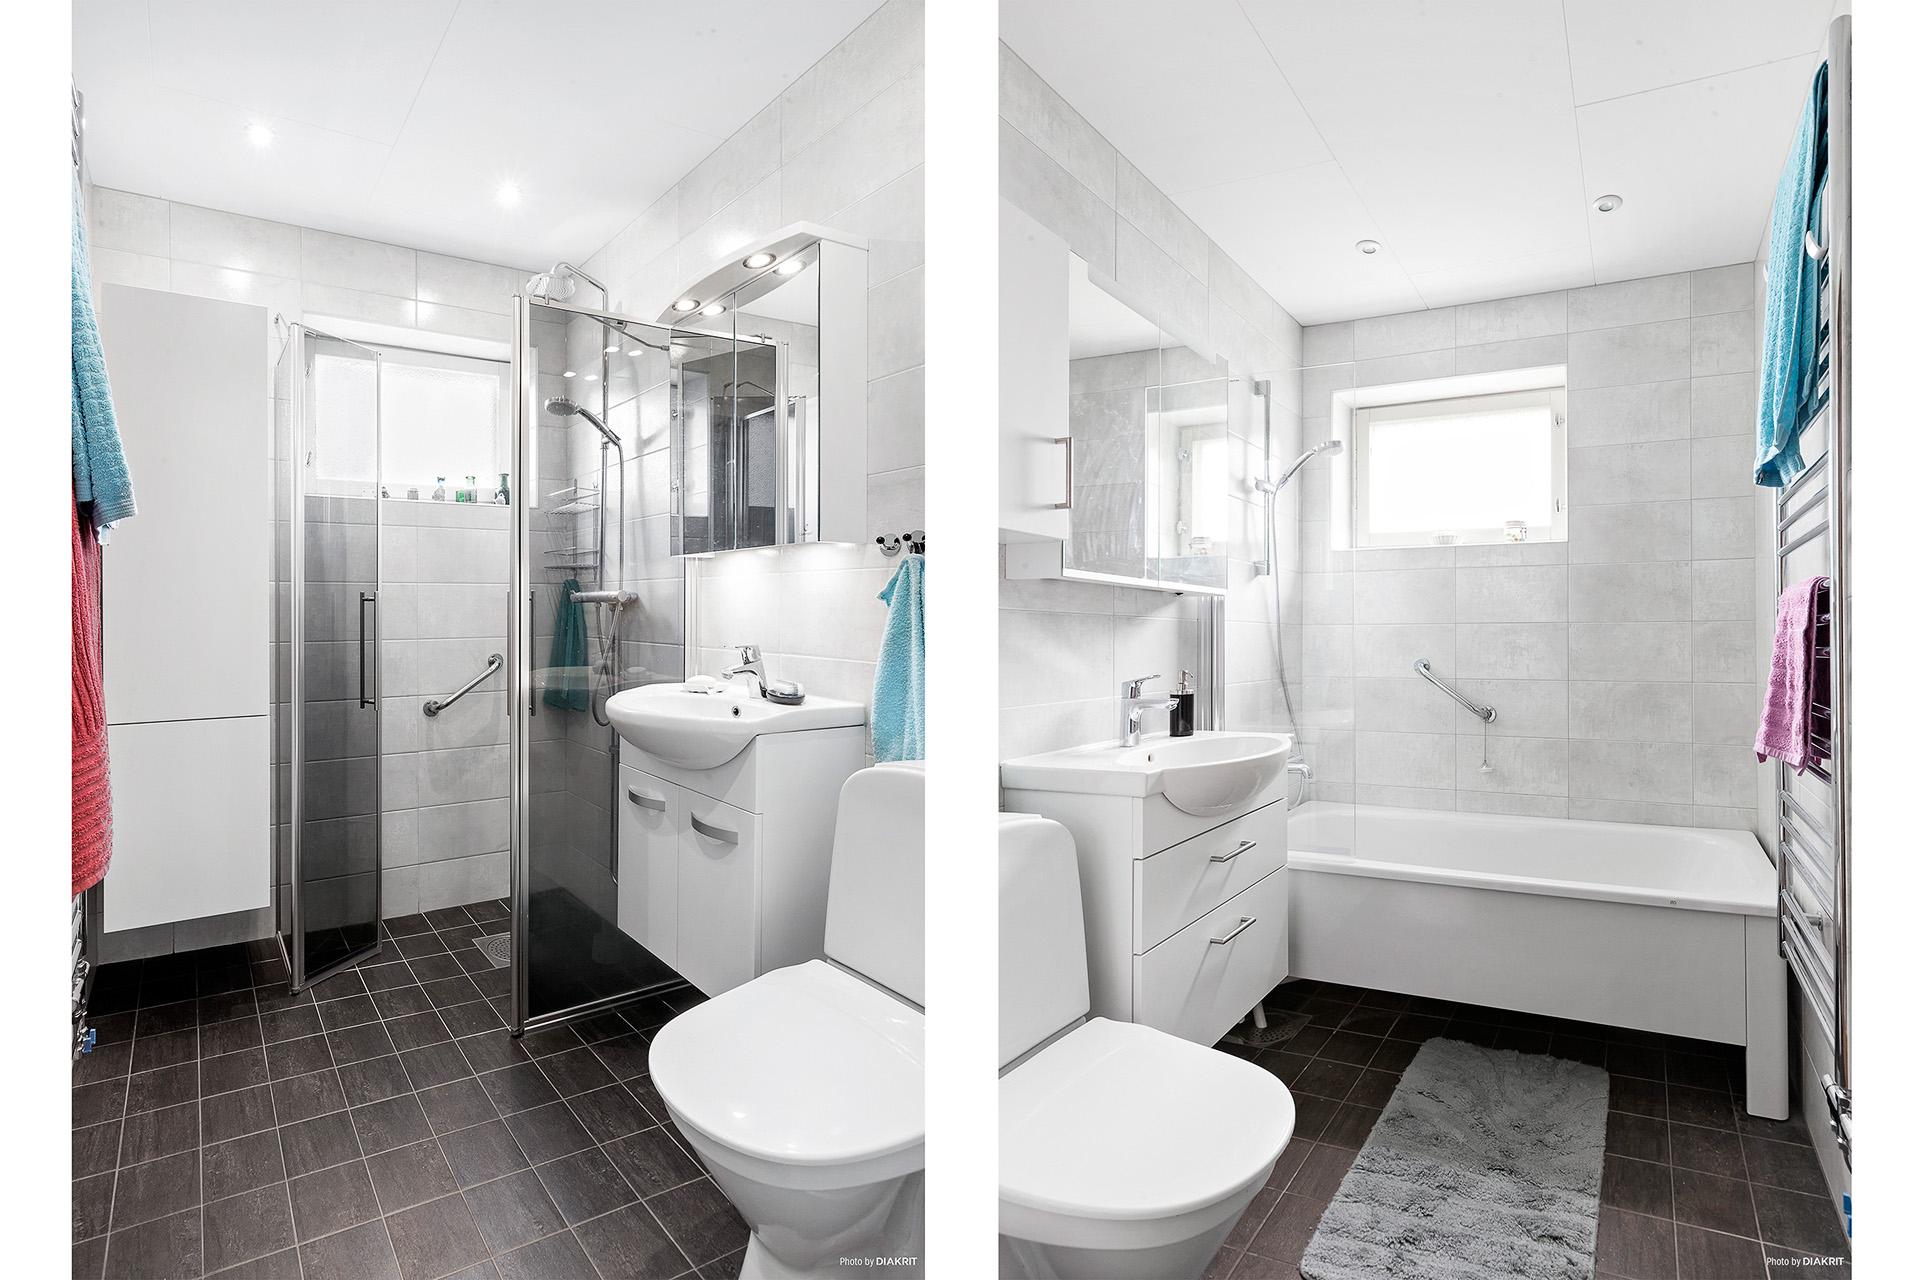 Två stycken badrum